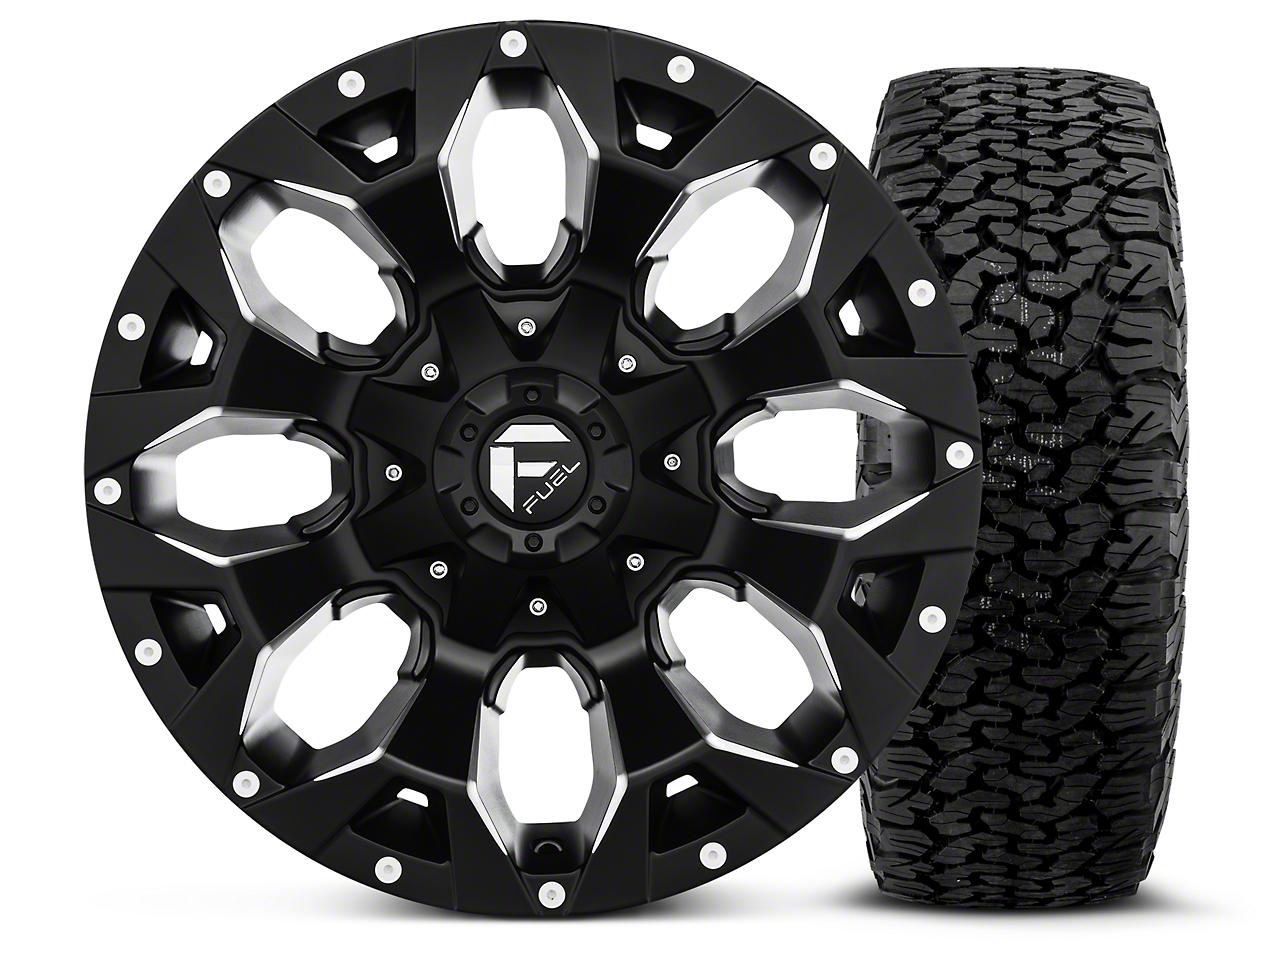 Fuel Wheels Assault Black Machined - 17x9 Wheel - and BF Goodrich All Terrain TA KO2 Tire - 315/70R17 (07-18 Jeep Wrangler JK; 2018 Jeep Wrangler JL)